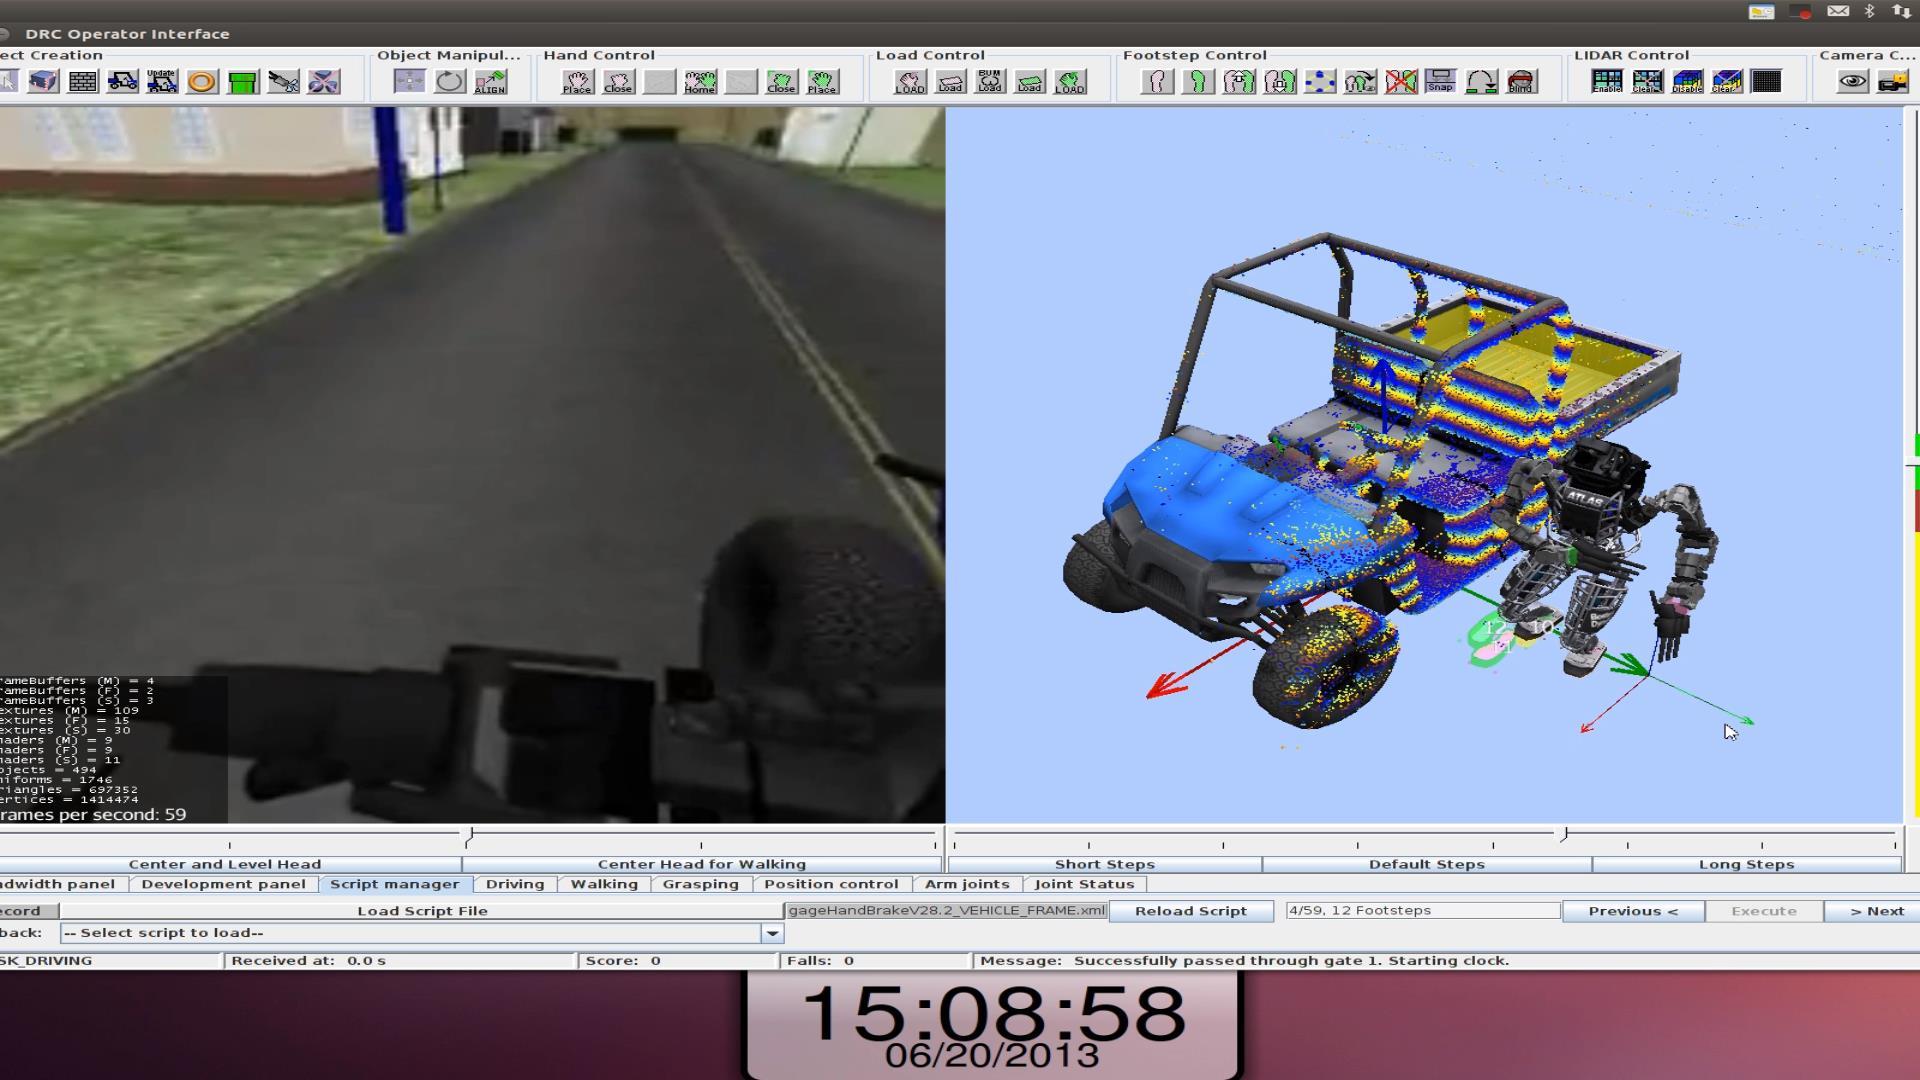 vrc_final_run14_driving (Subclip3).jpg